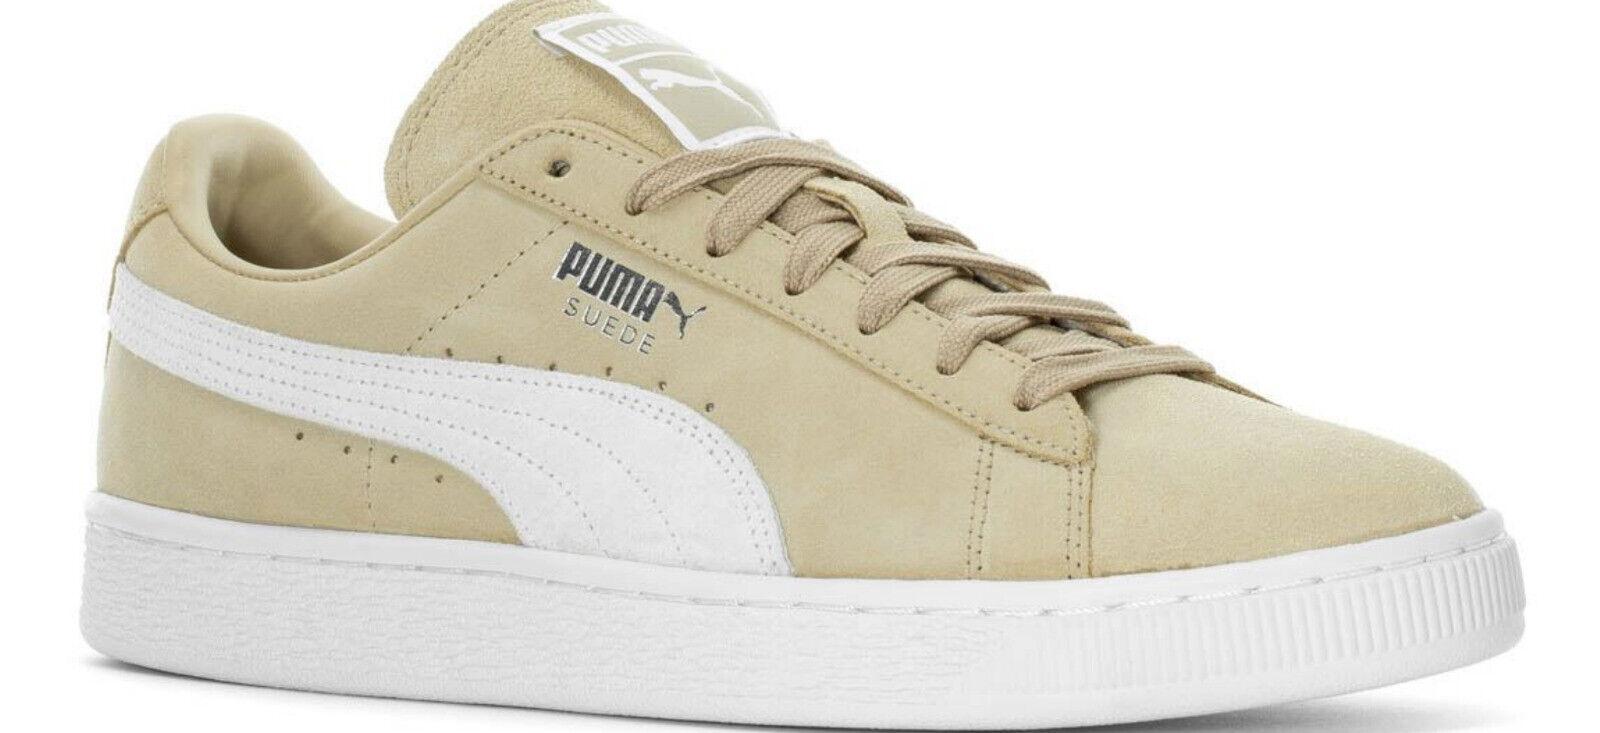 NWOB  Men's  Puma Classic Suede safari white  shoes Lifestyle   363242 39 shoes